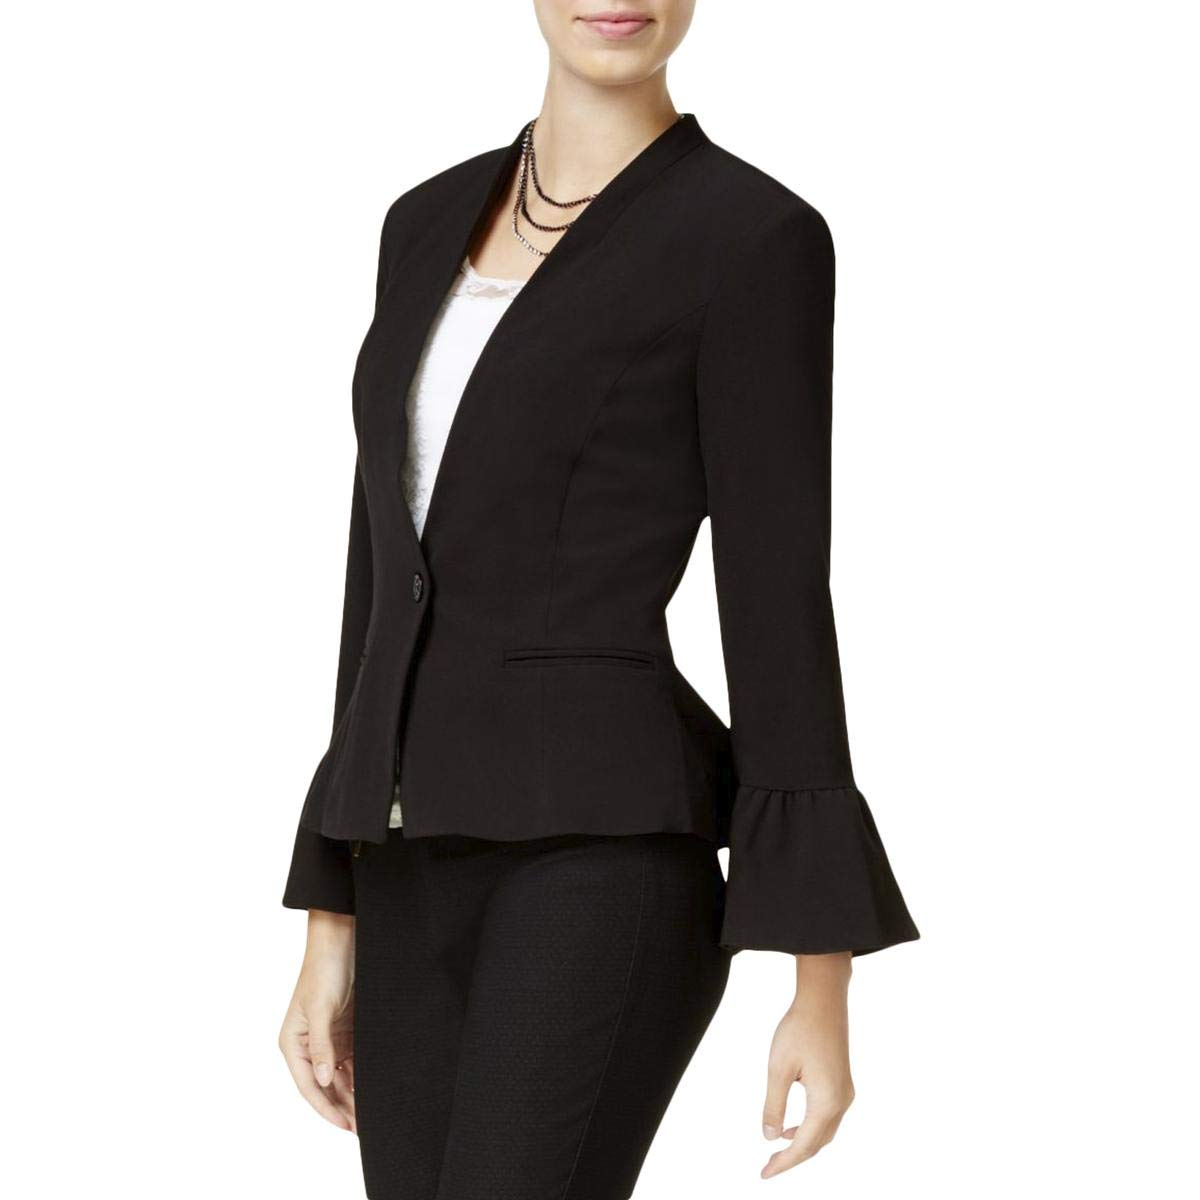 XOXO Womens Juniors Peplum Bell Sleeves One-Button Blazer Black S